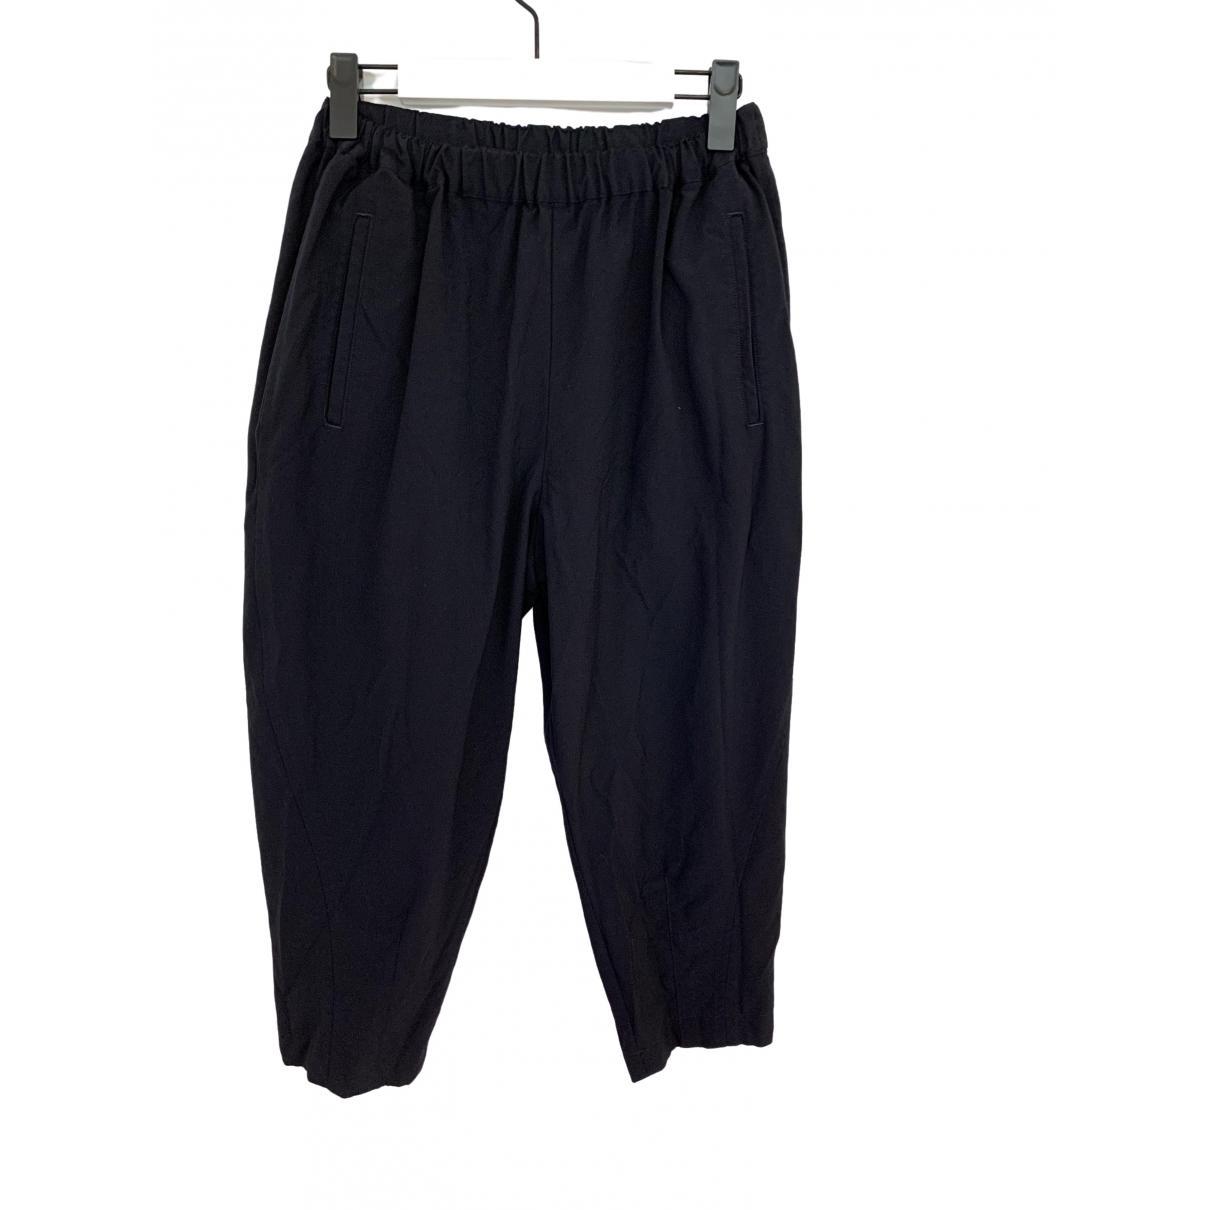 Comme Des Garcons \N Black Wool Trousers for Women XS International